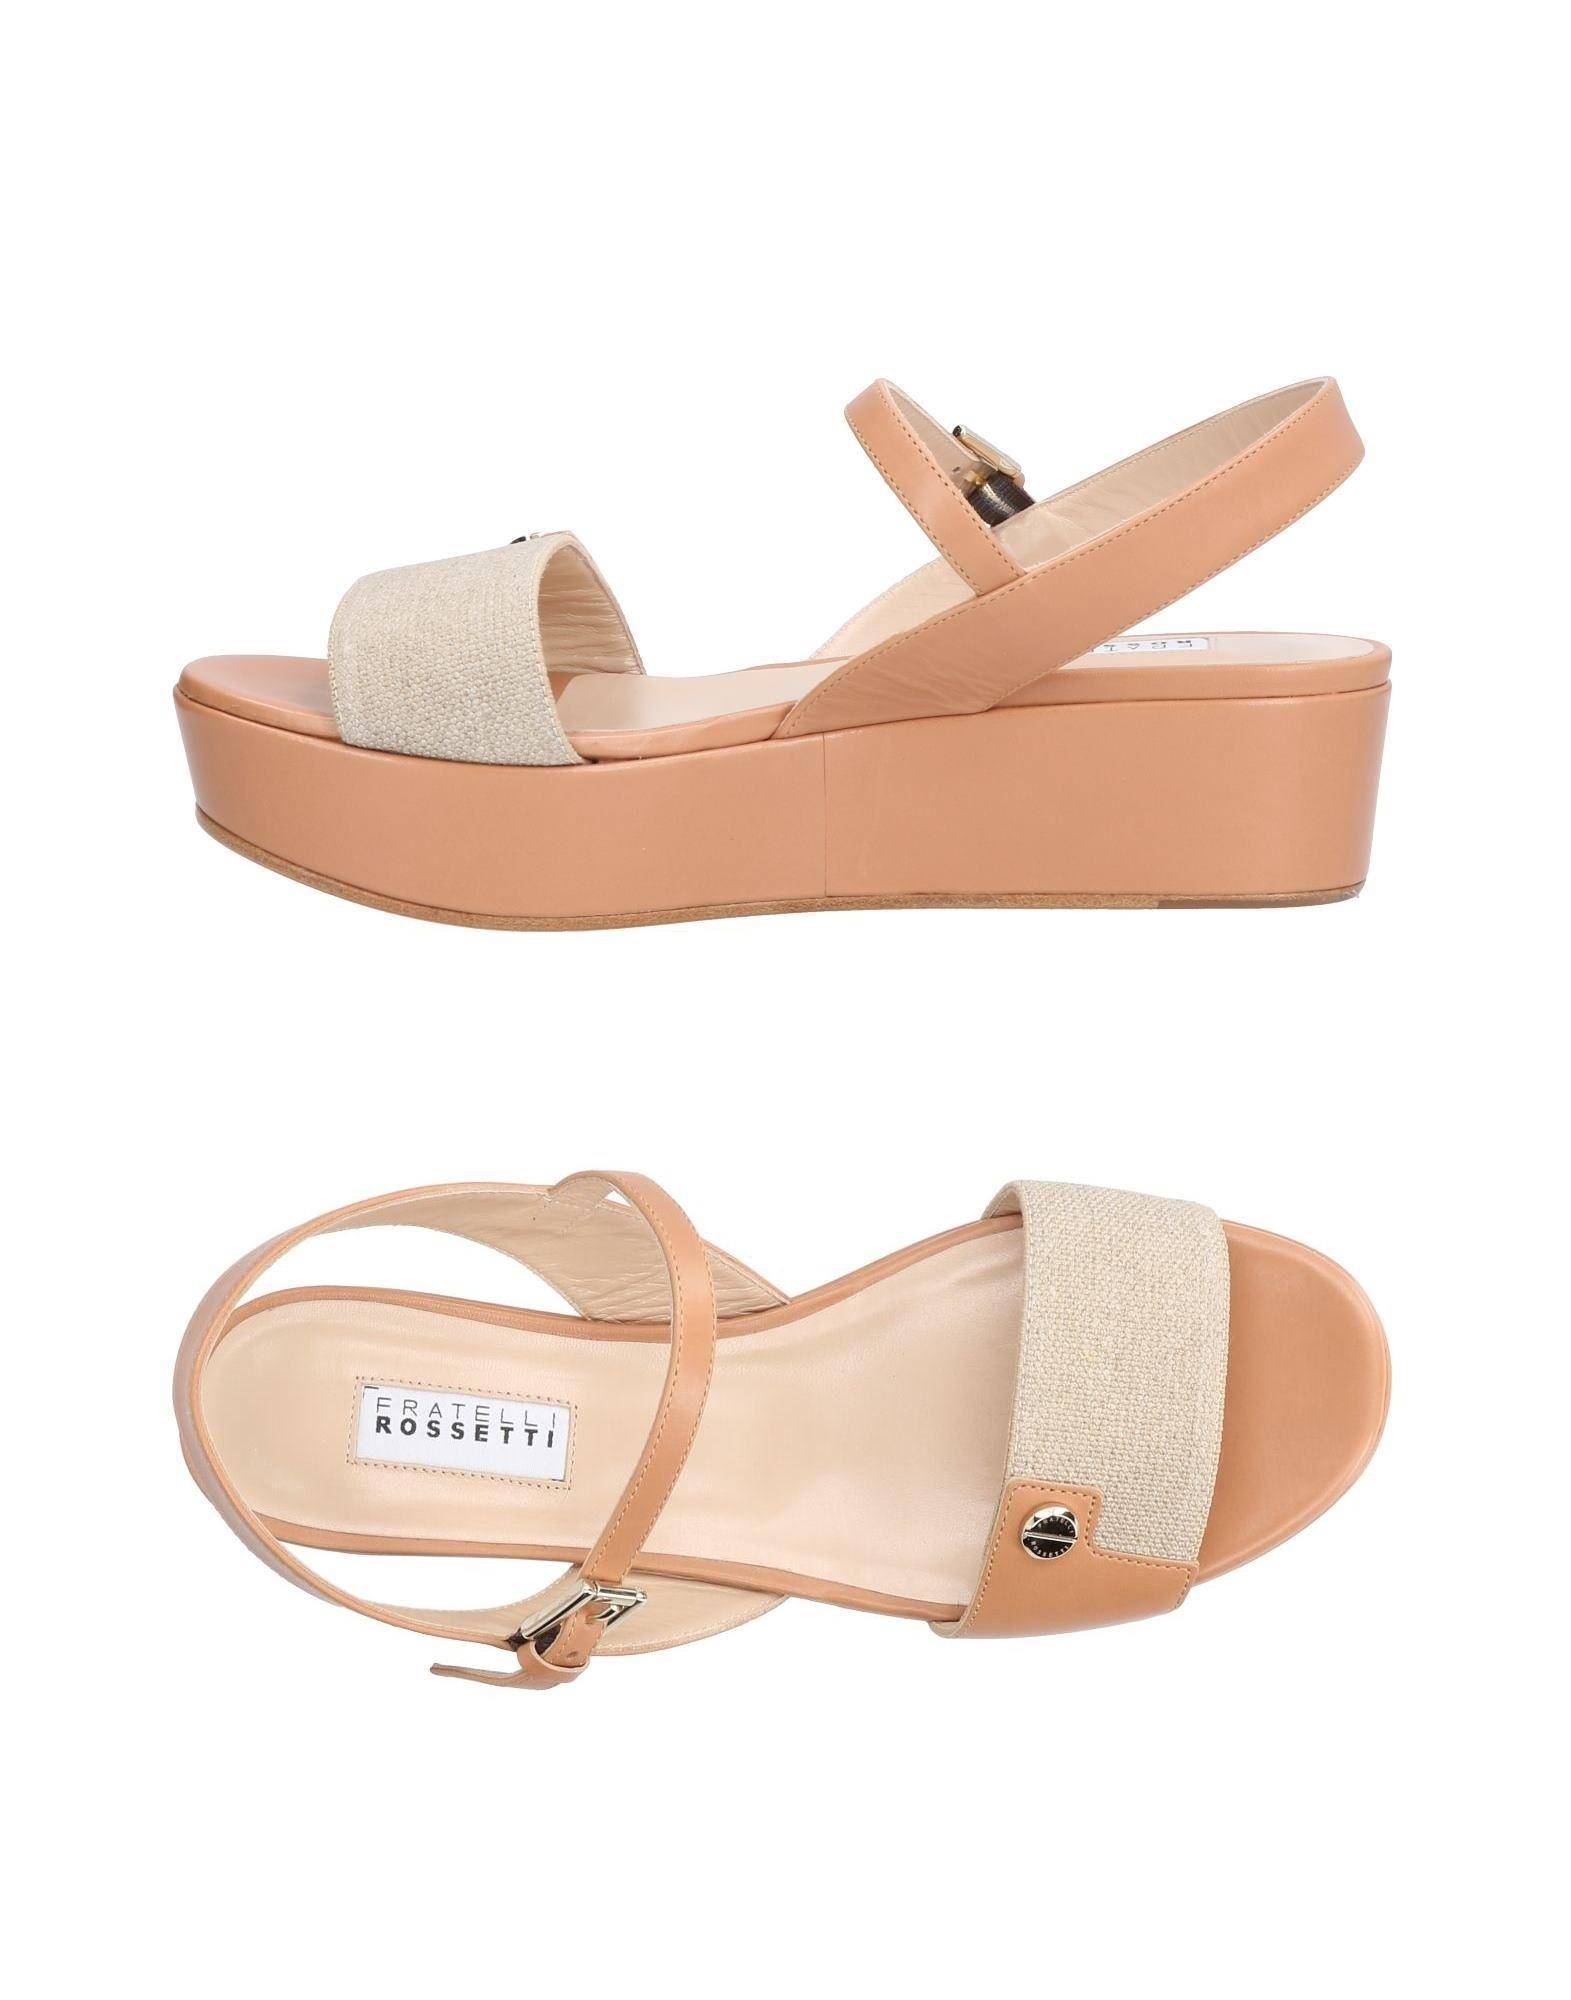 Fratelli Rossetti Sandalen Damen  11440682PCGut aussehende strapazierfähige Schuhe